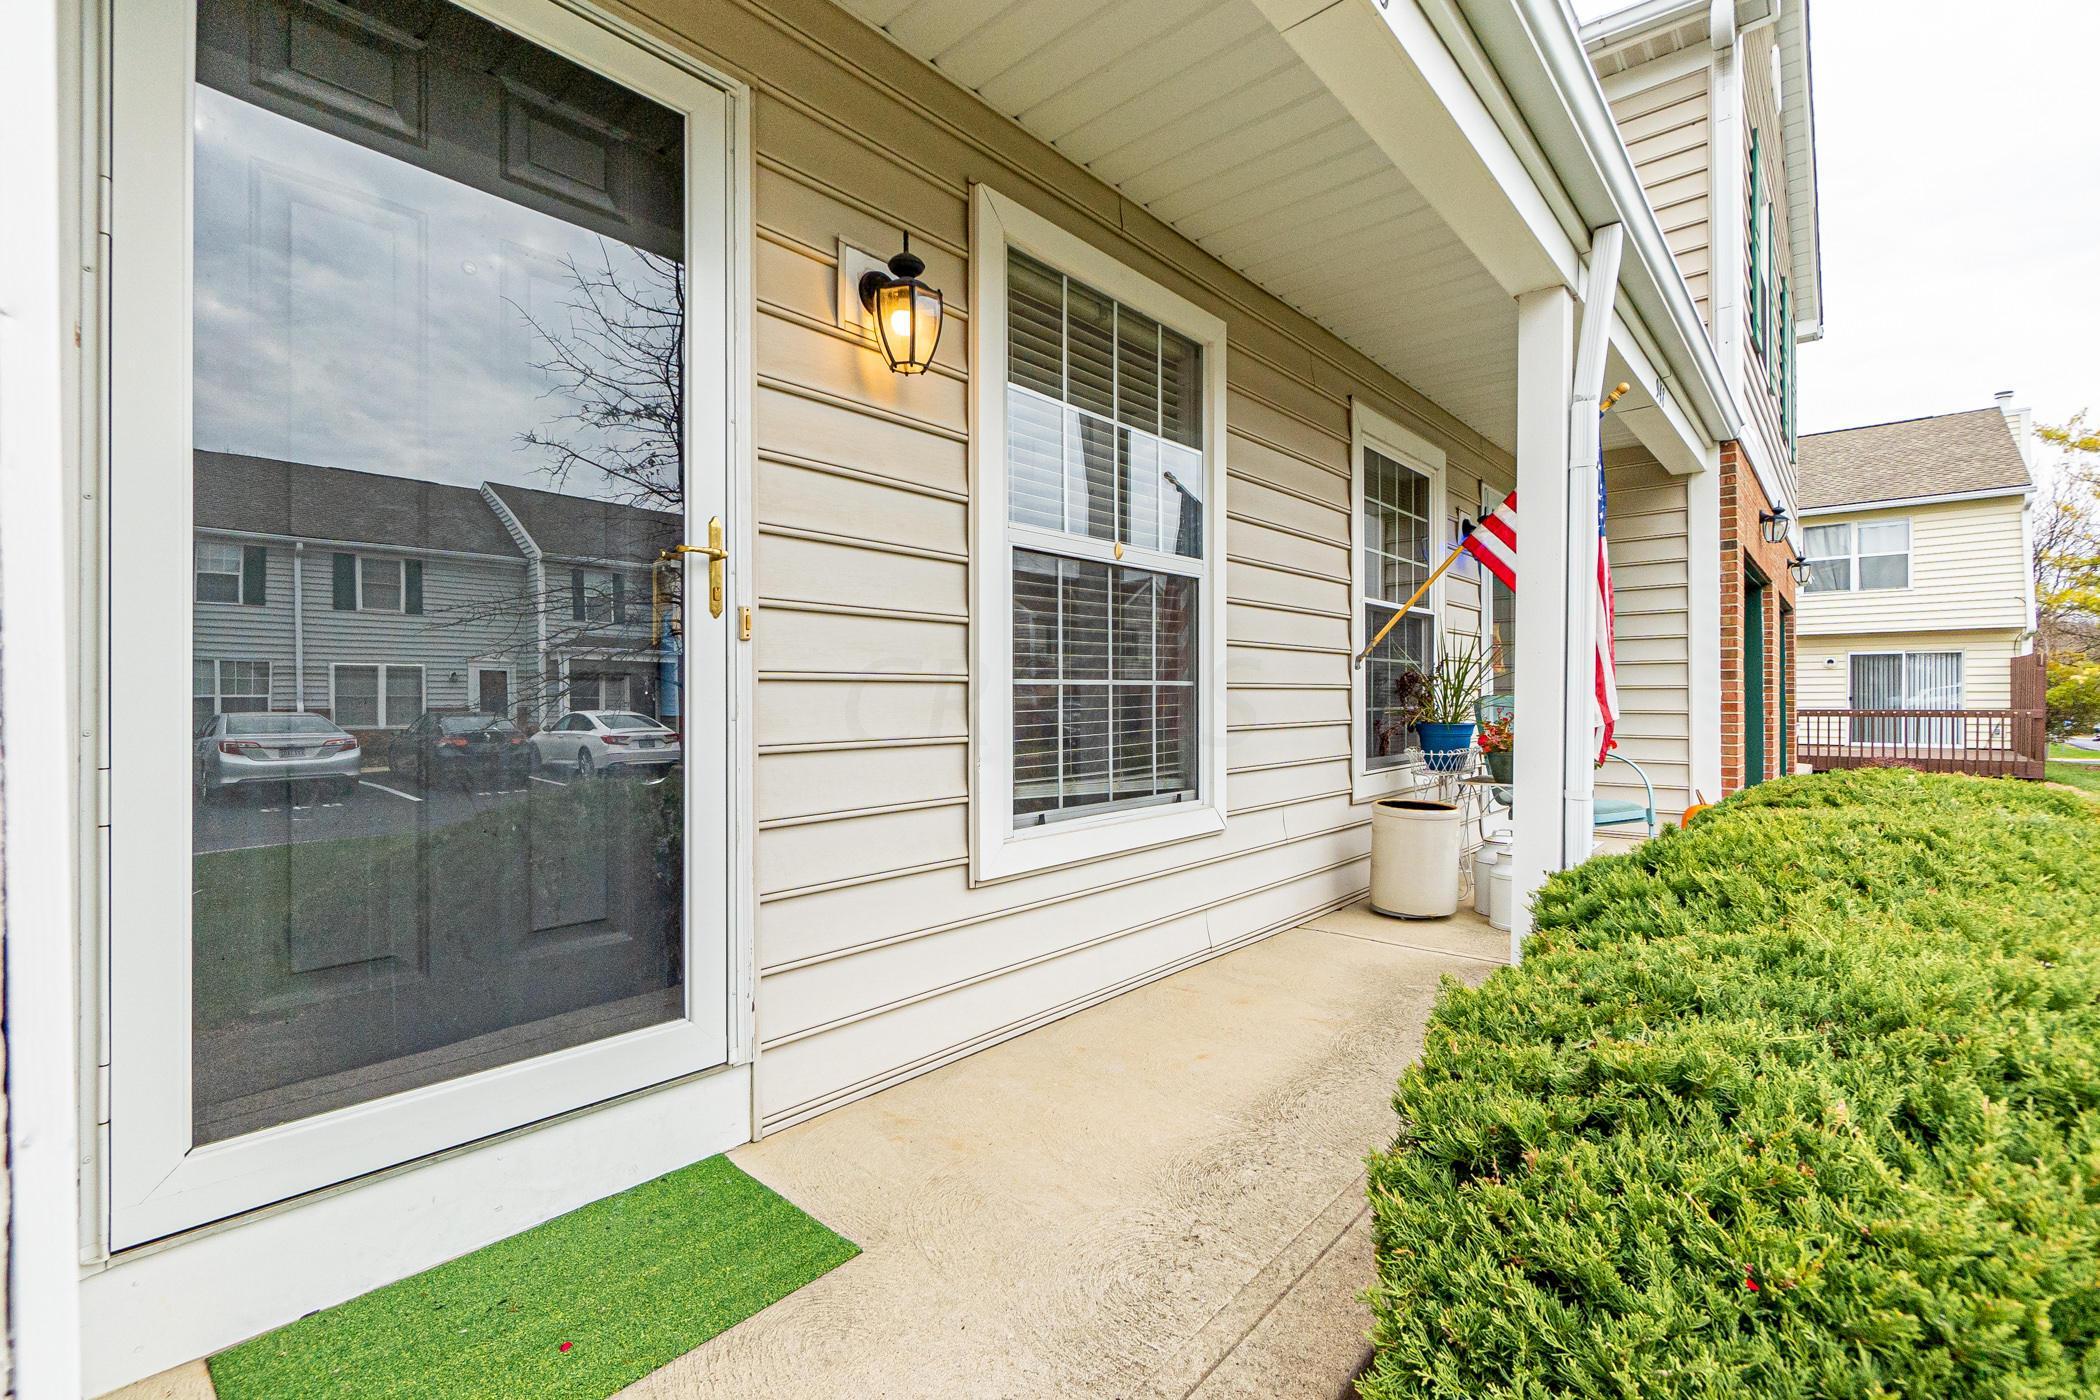 946 Philadelphia Drive, Westerville, Ohio 43081, 3 Bedrooms Bedrooms, ,3 BathroomsBathrooms,Residential,For Sale,Philadelphia,220041093